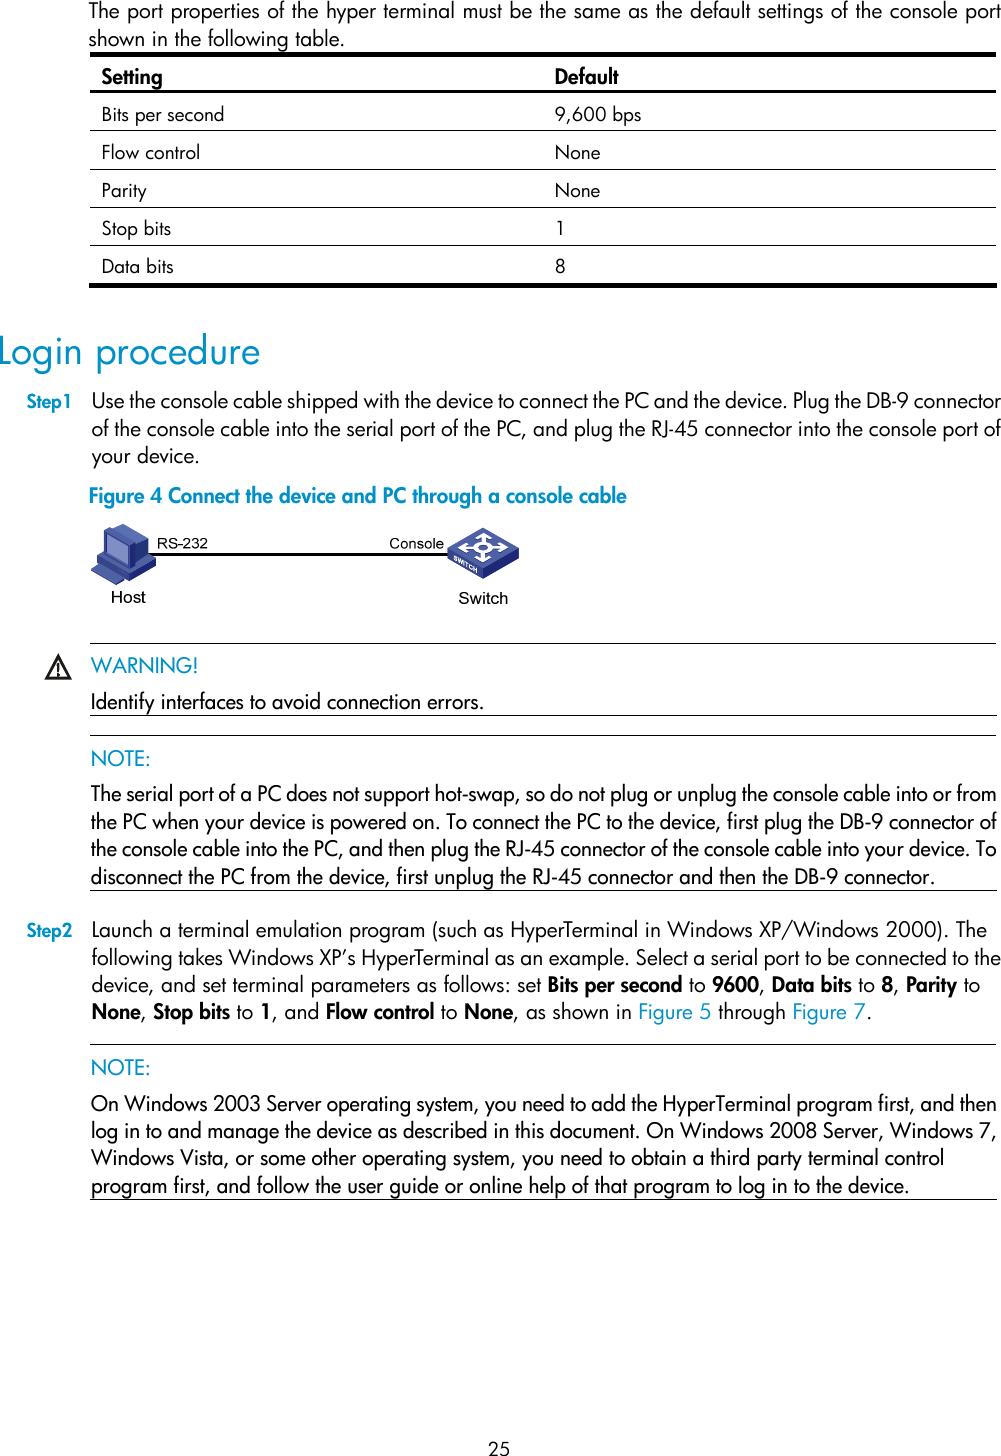 Hp A3100 16 V2 Ei Users Manual